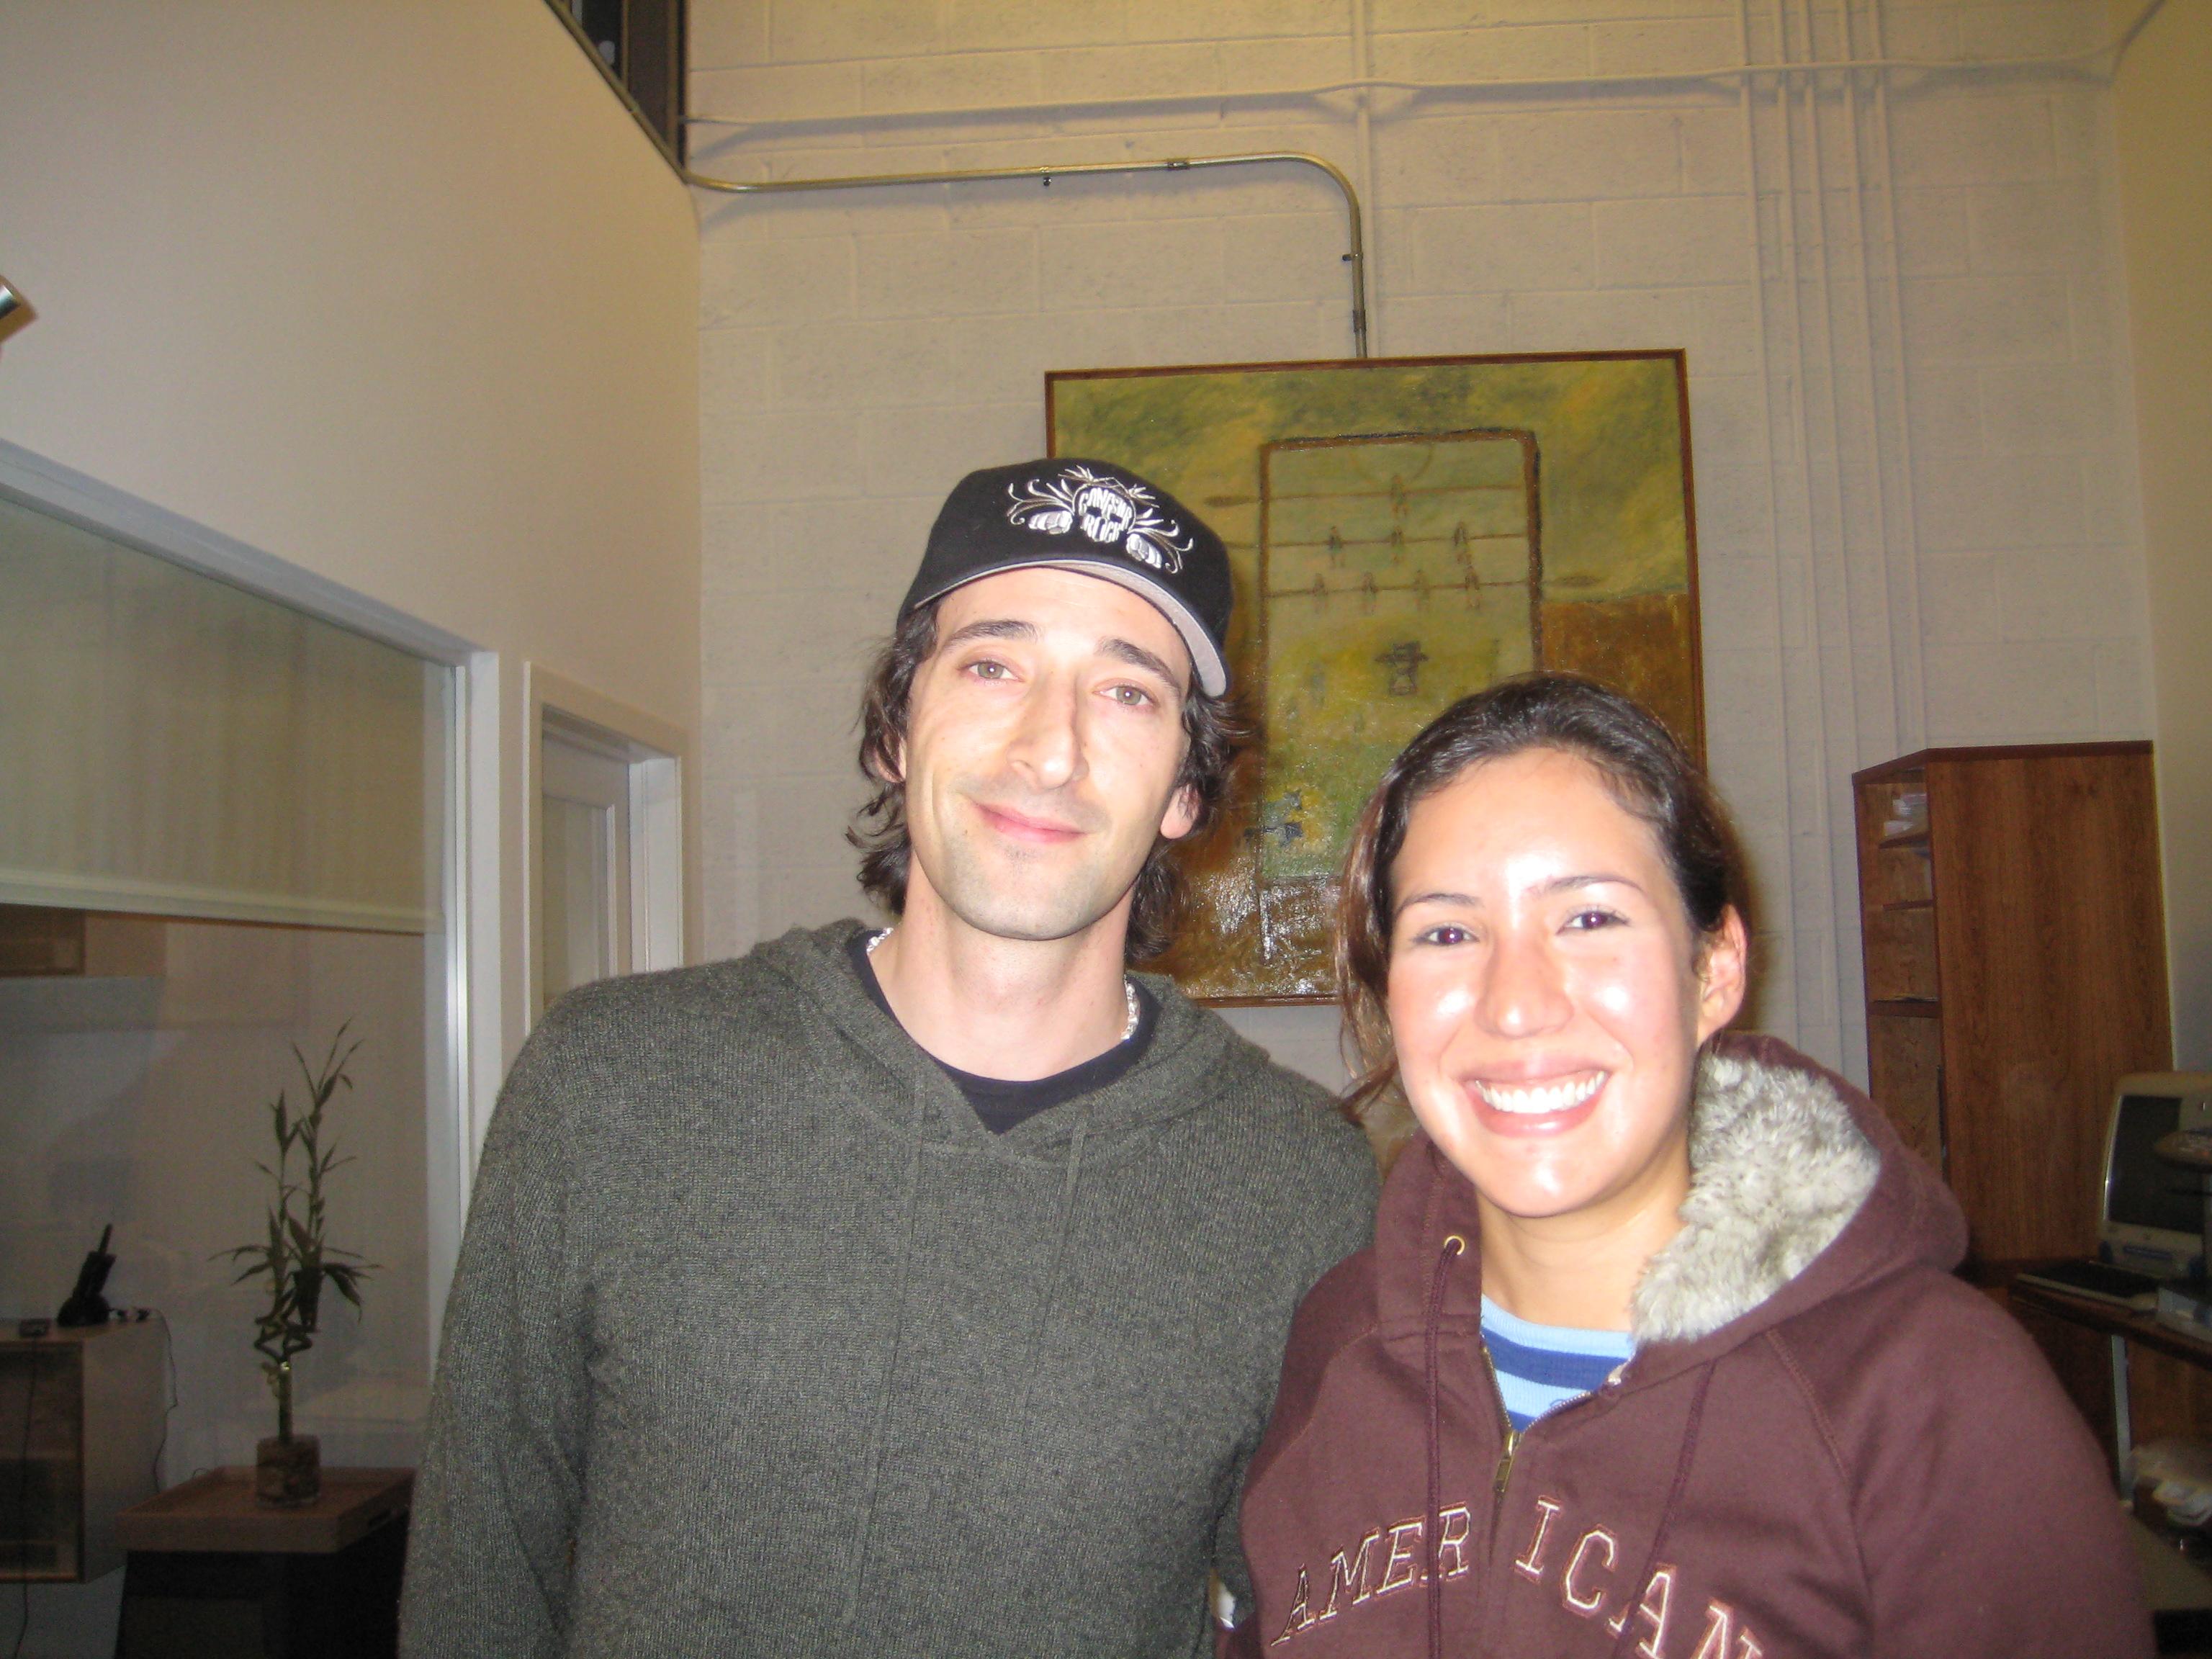 Adrien Brody,Academy Award Winner, produciendo enUpstairs.